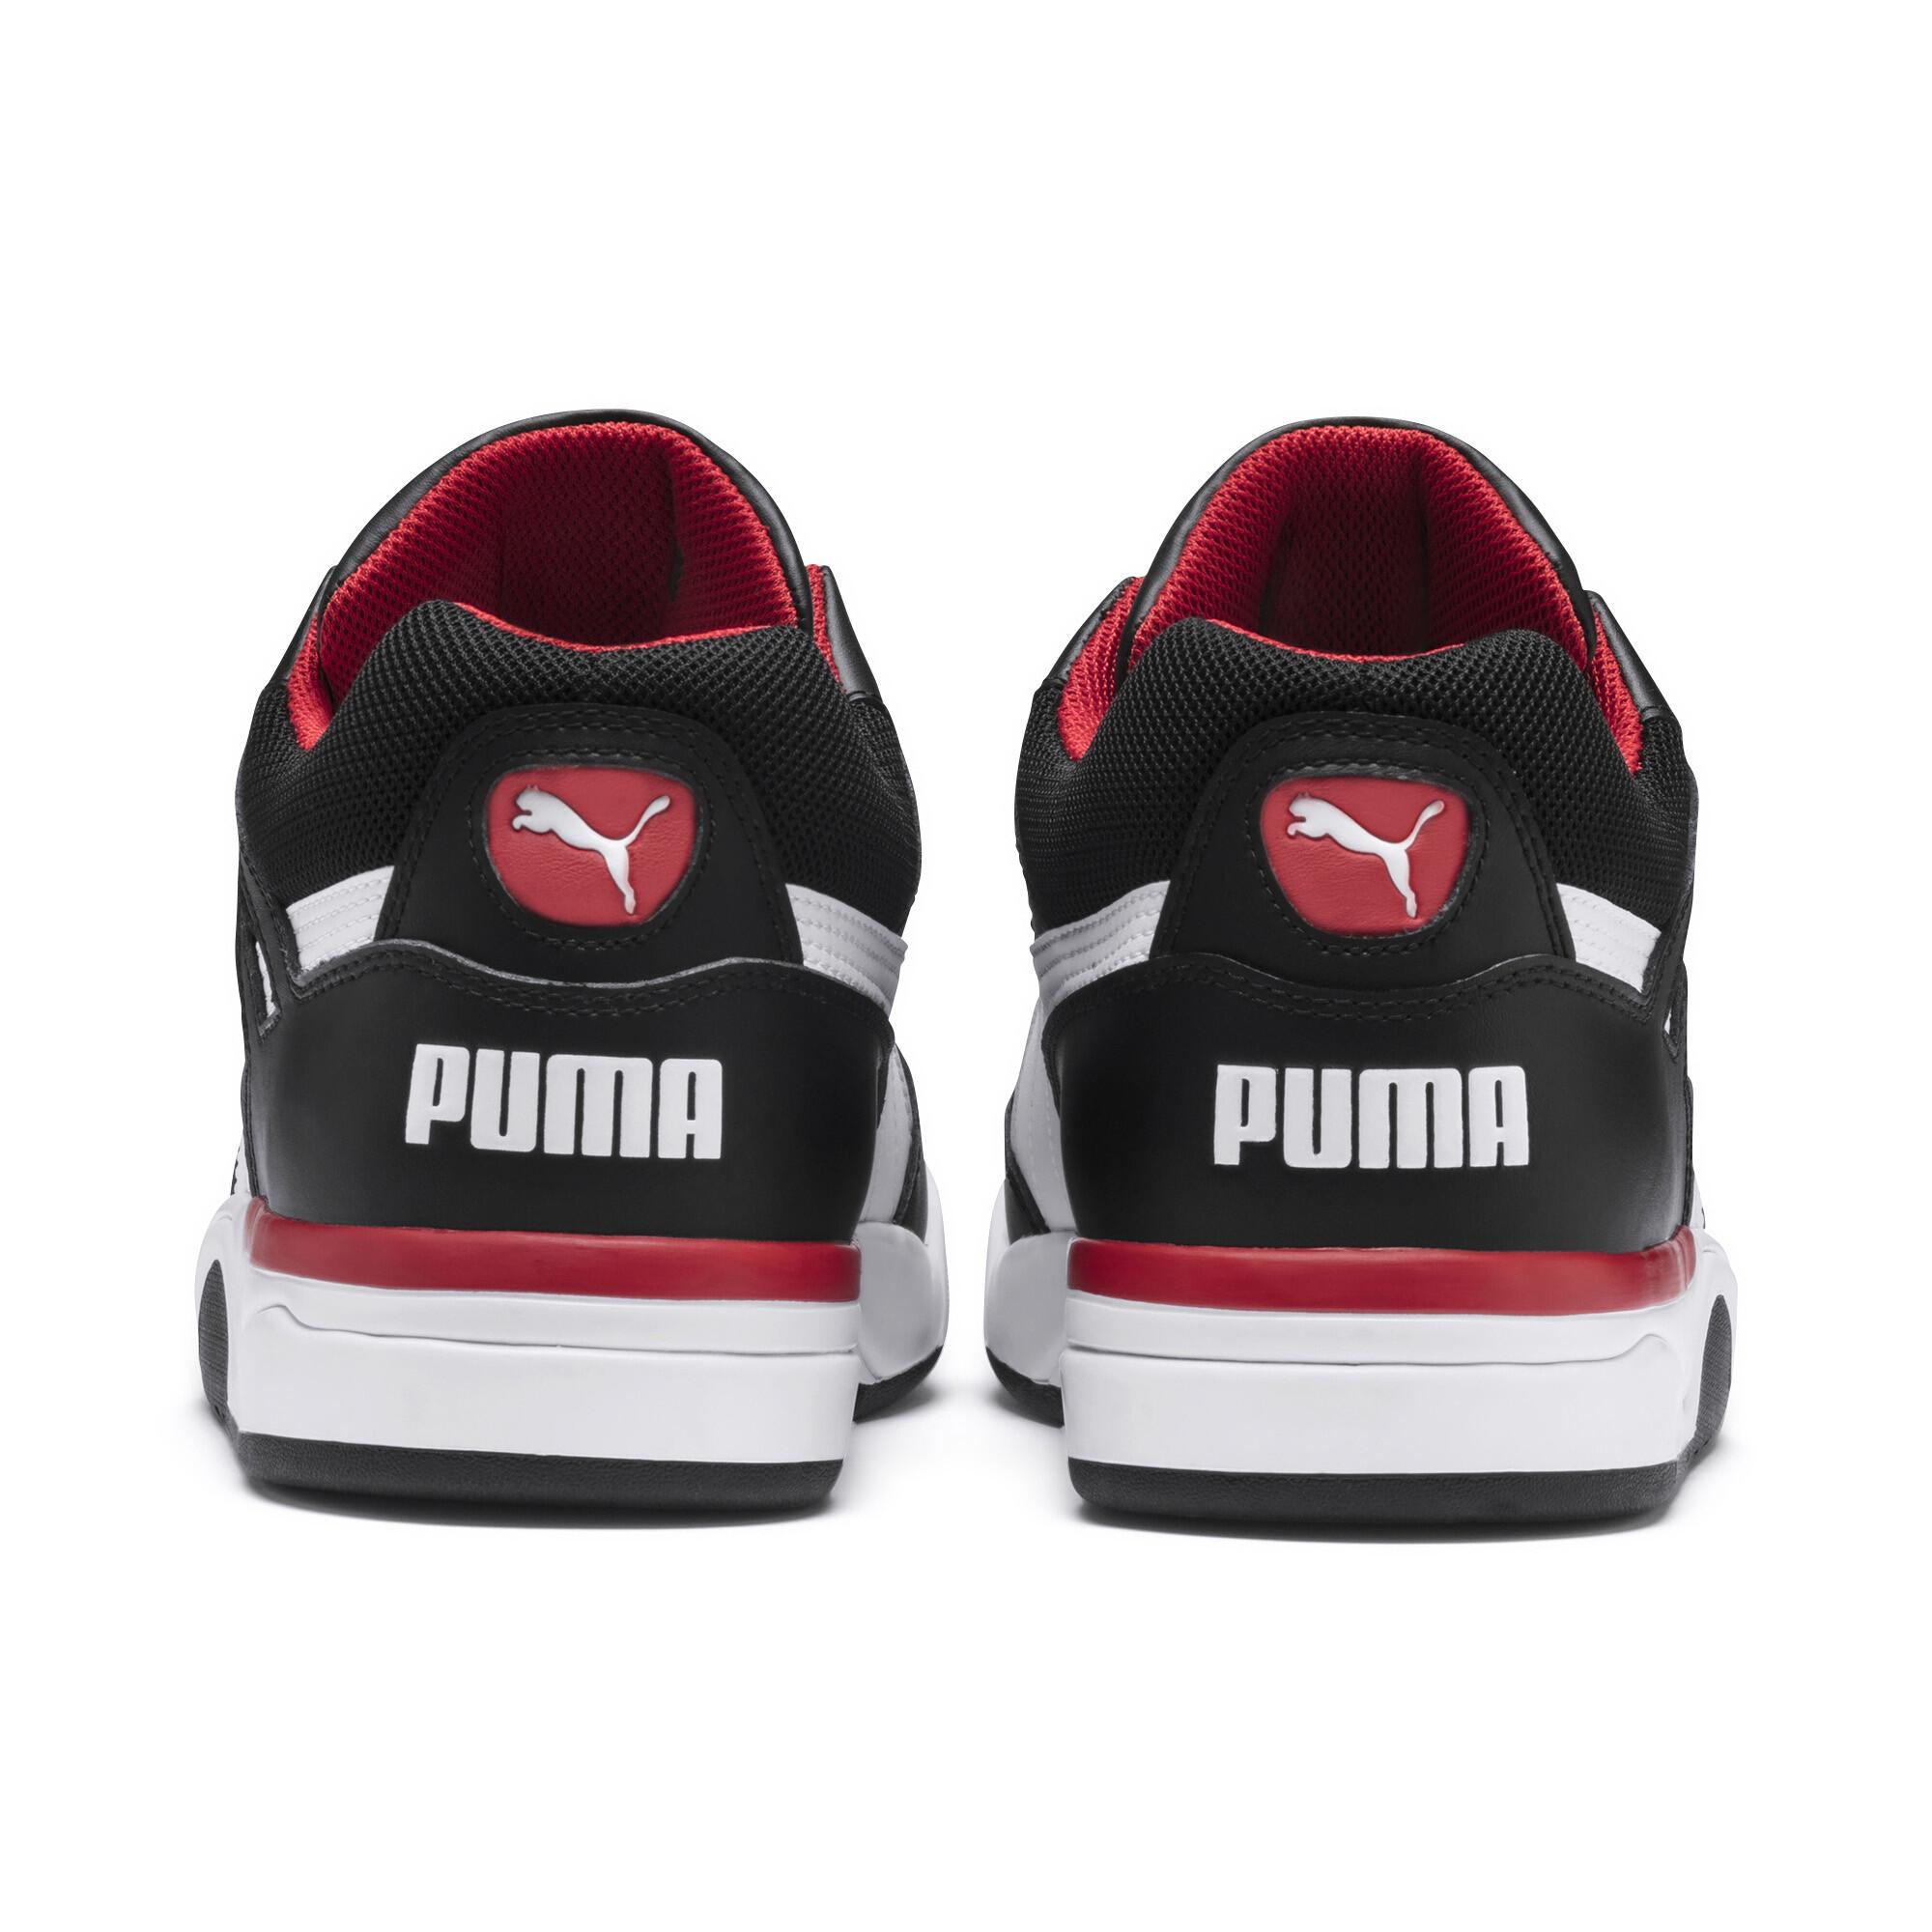 Indexbild 3 - PUMA Palace Guard Sneaker Unisex Schuhe Sport Classics Neu